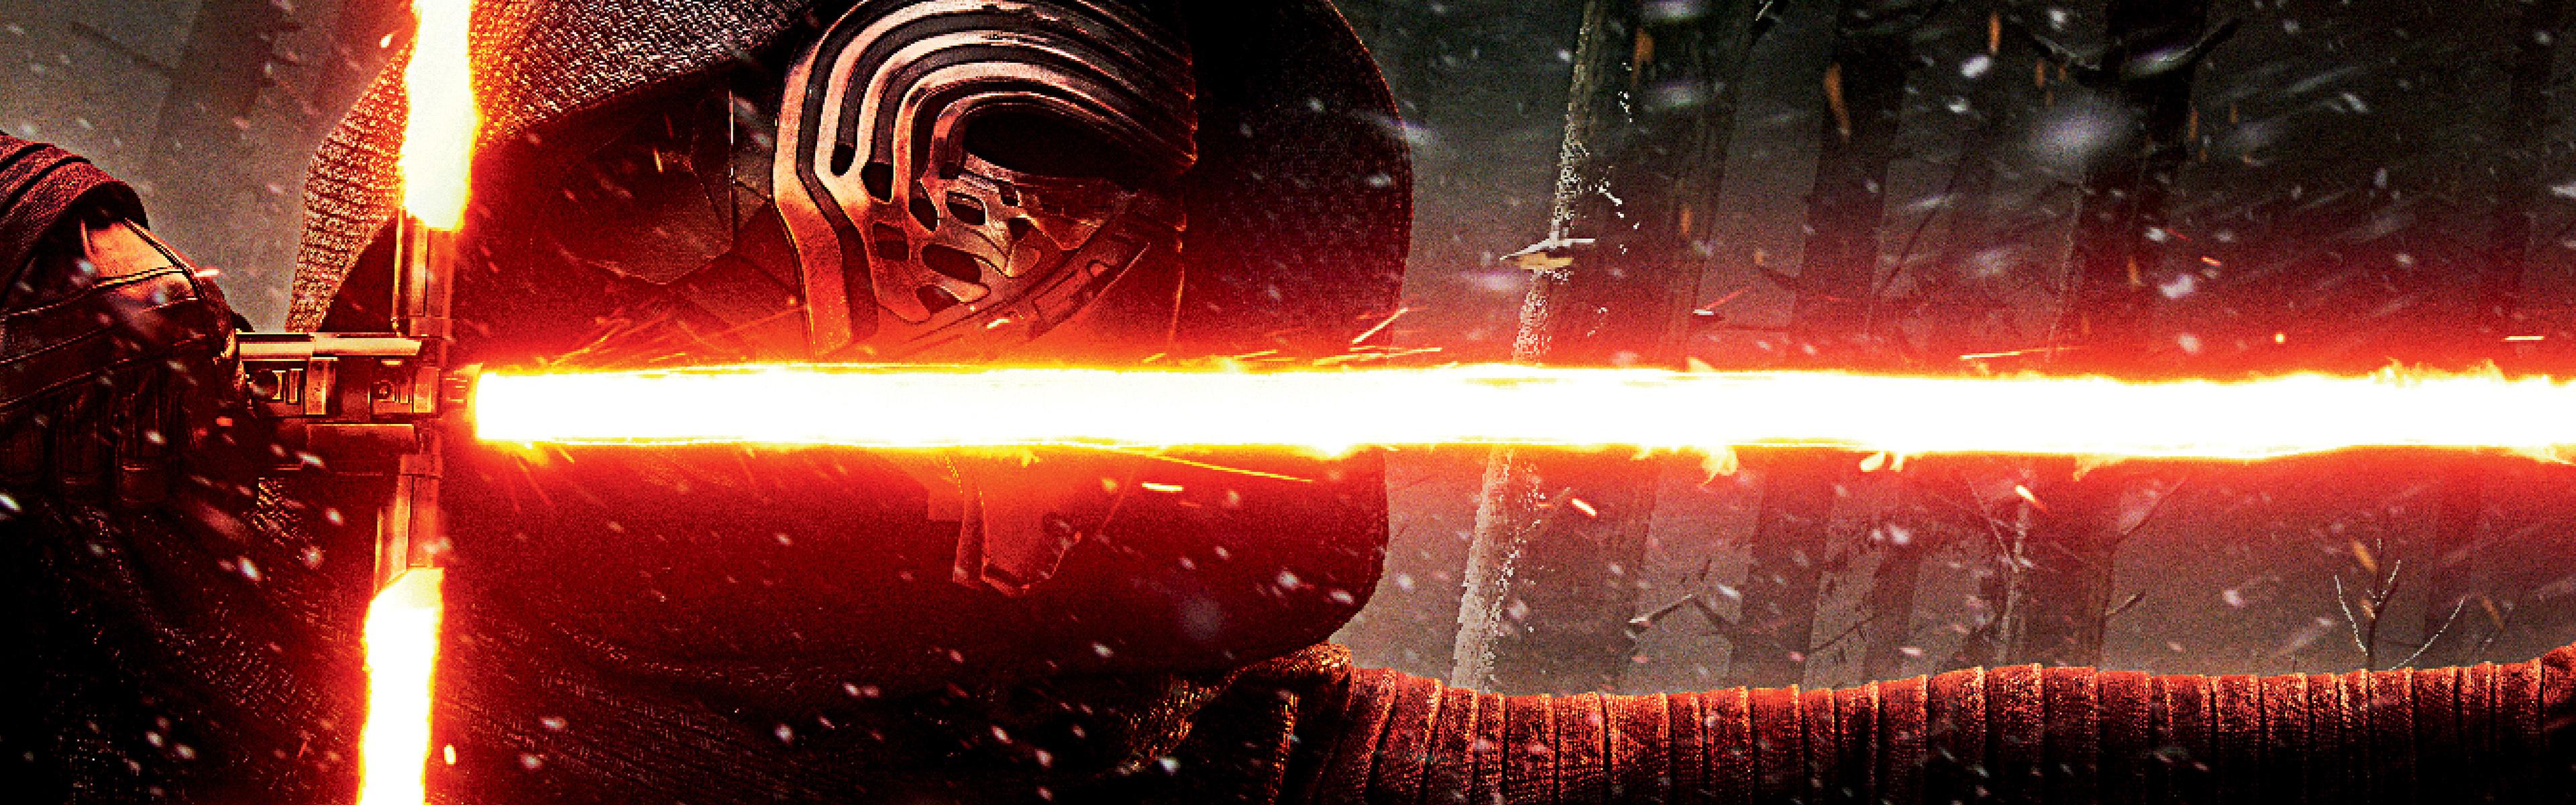 Kylo Ren Force FX Lightsaber Wallpapers HD Wallpapers 3840x1200